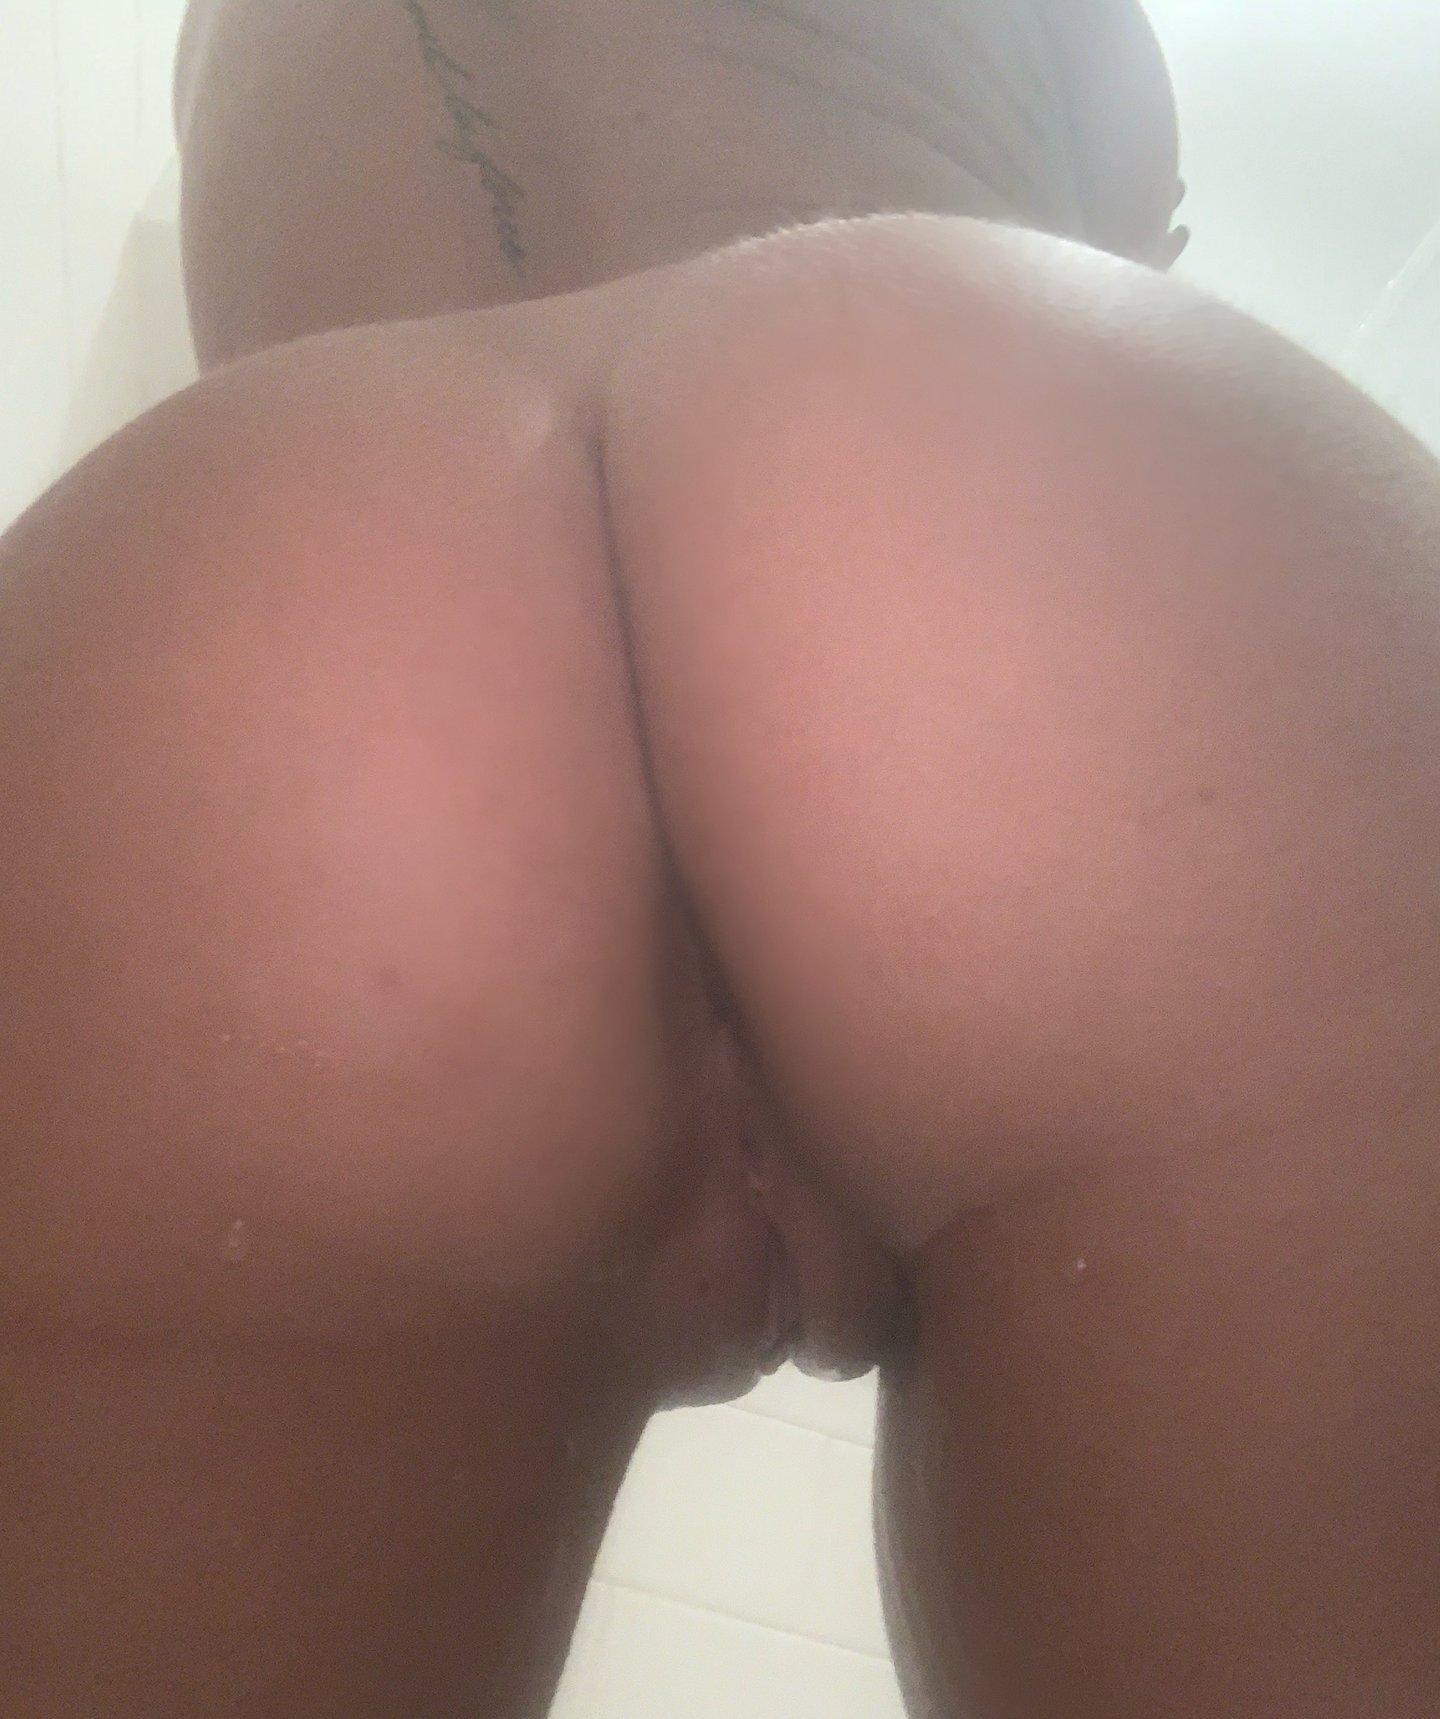 Jill Sadmachinethot Onlyfans Nude Leaks 0035